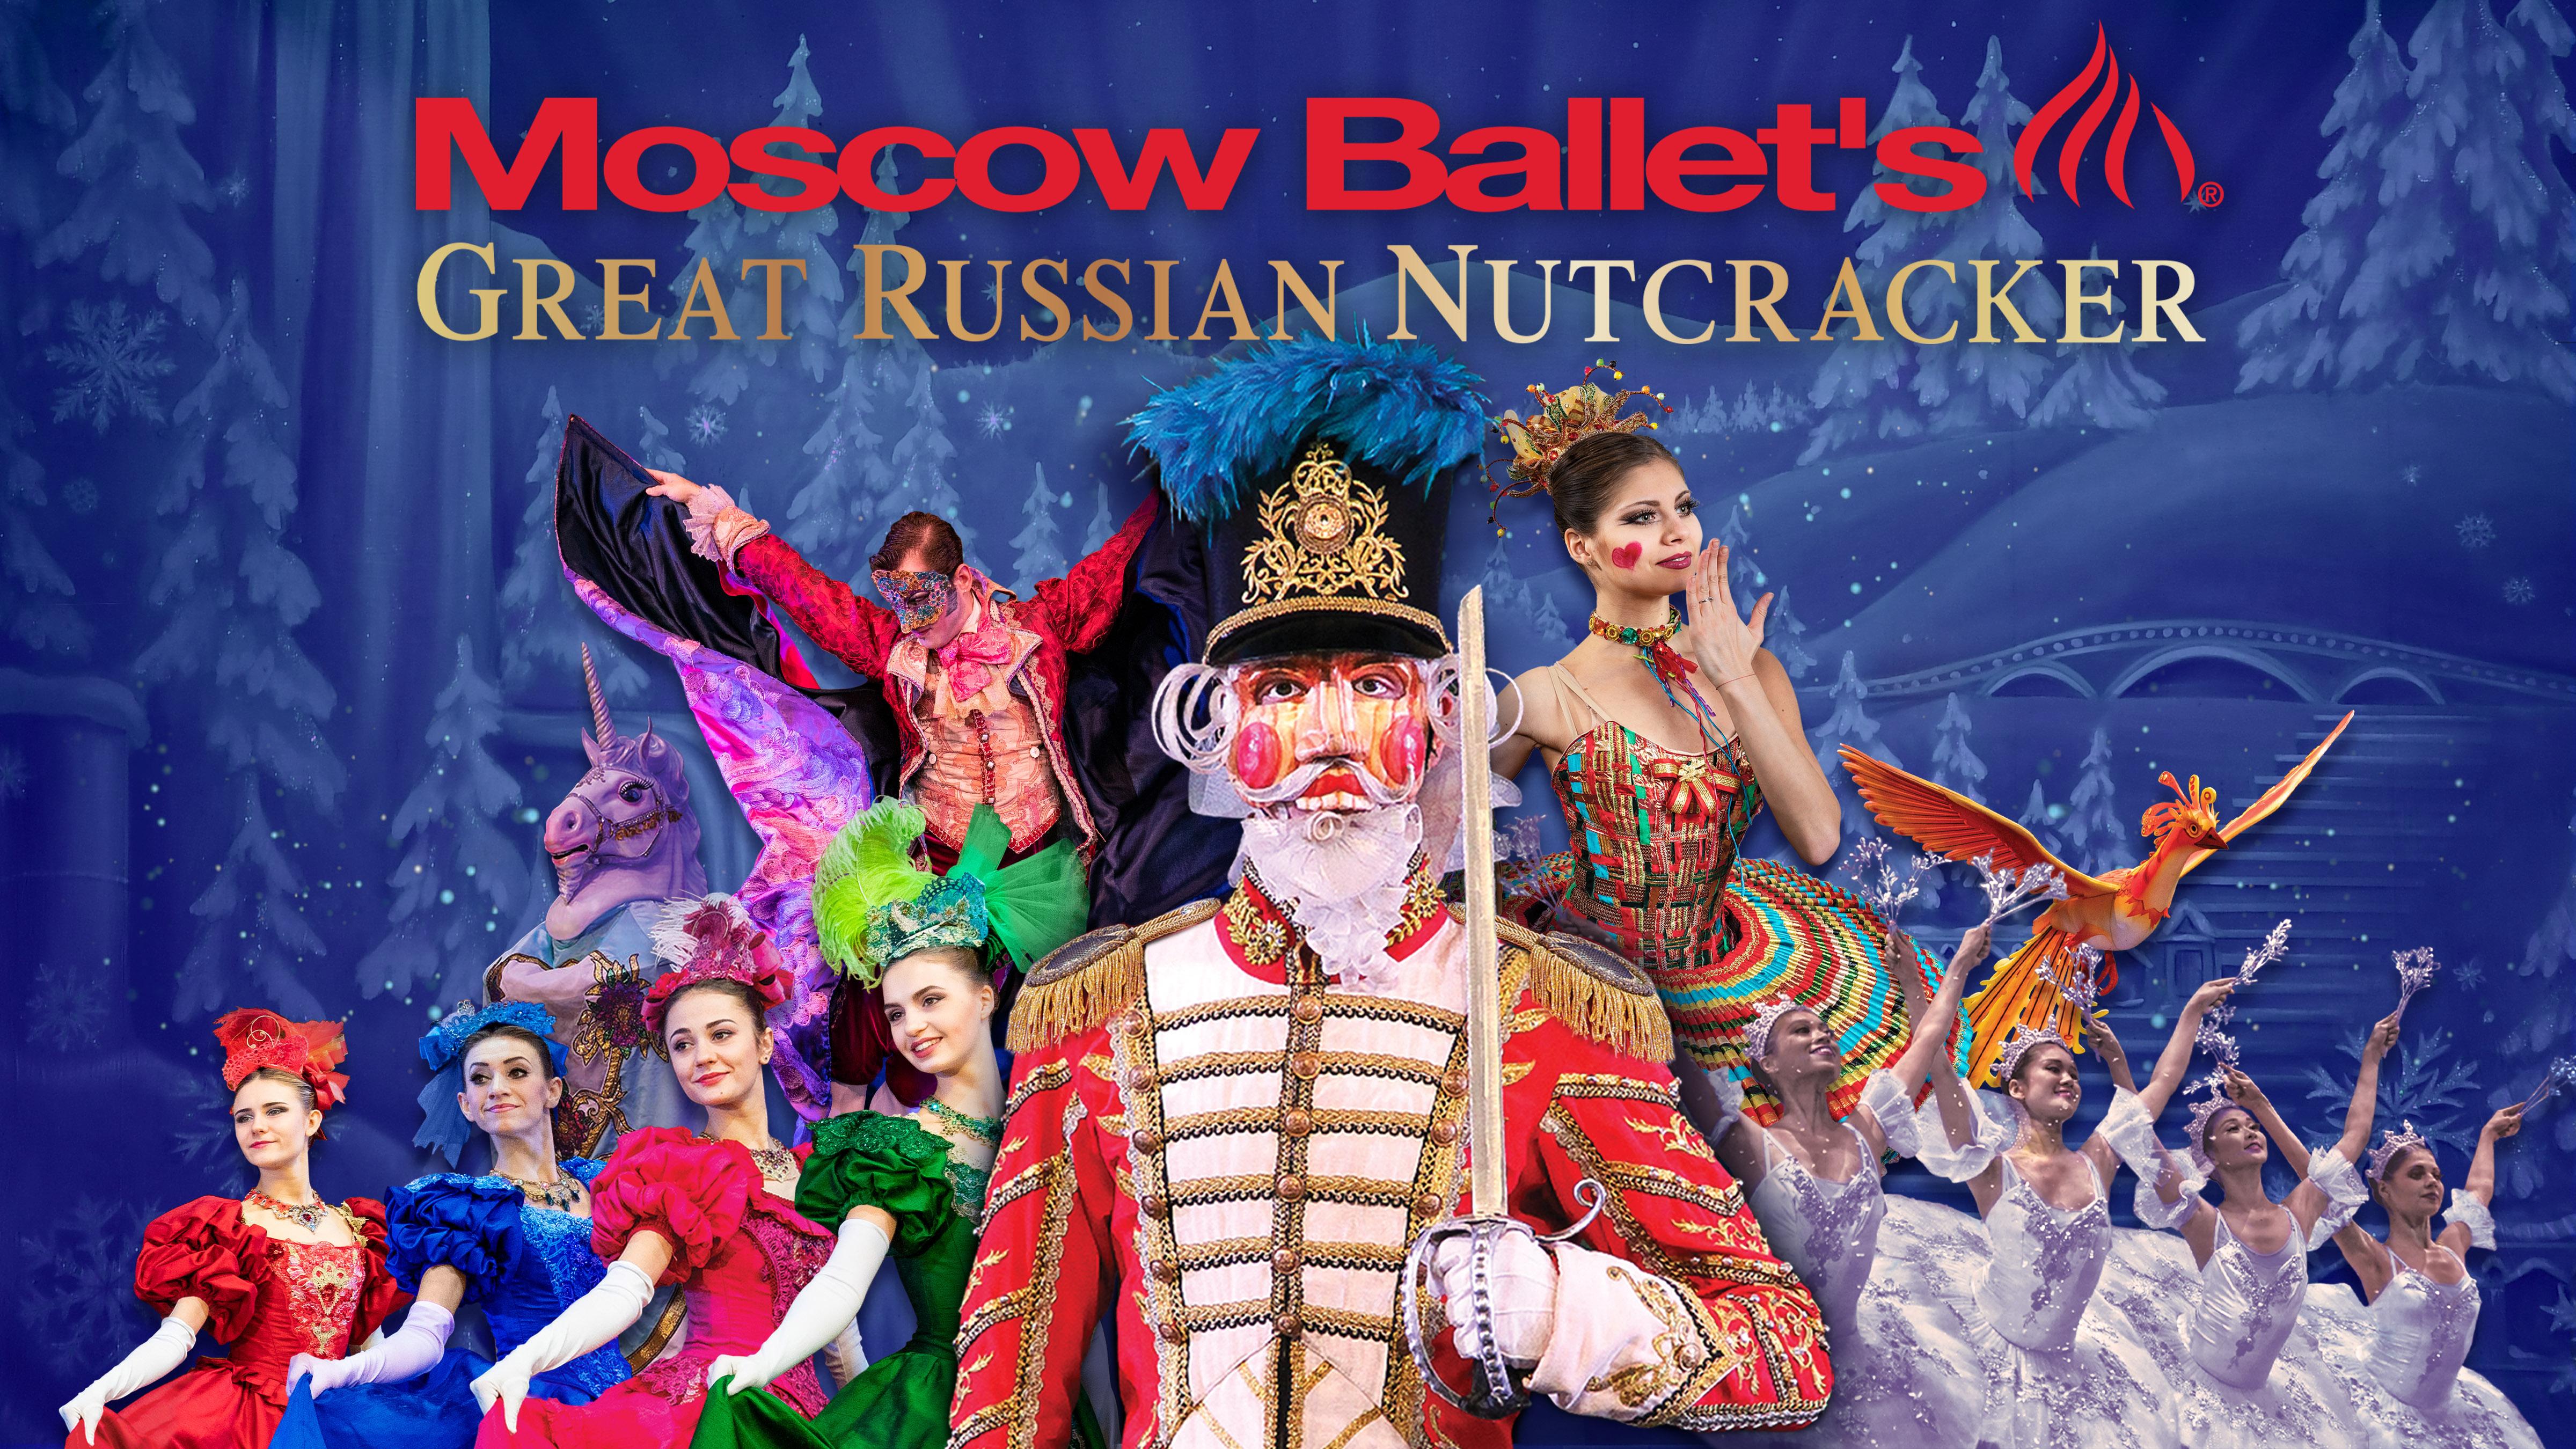 Moscow Ballet S Great Russian Nutcracker The Seattle Globalist